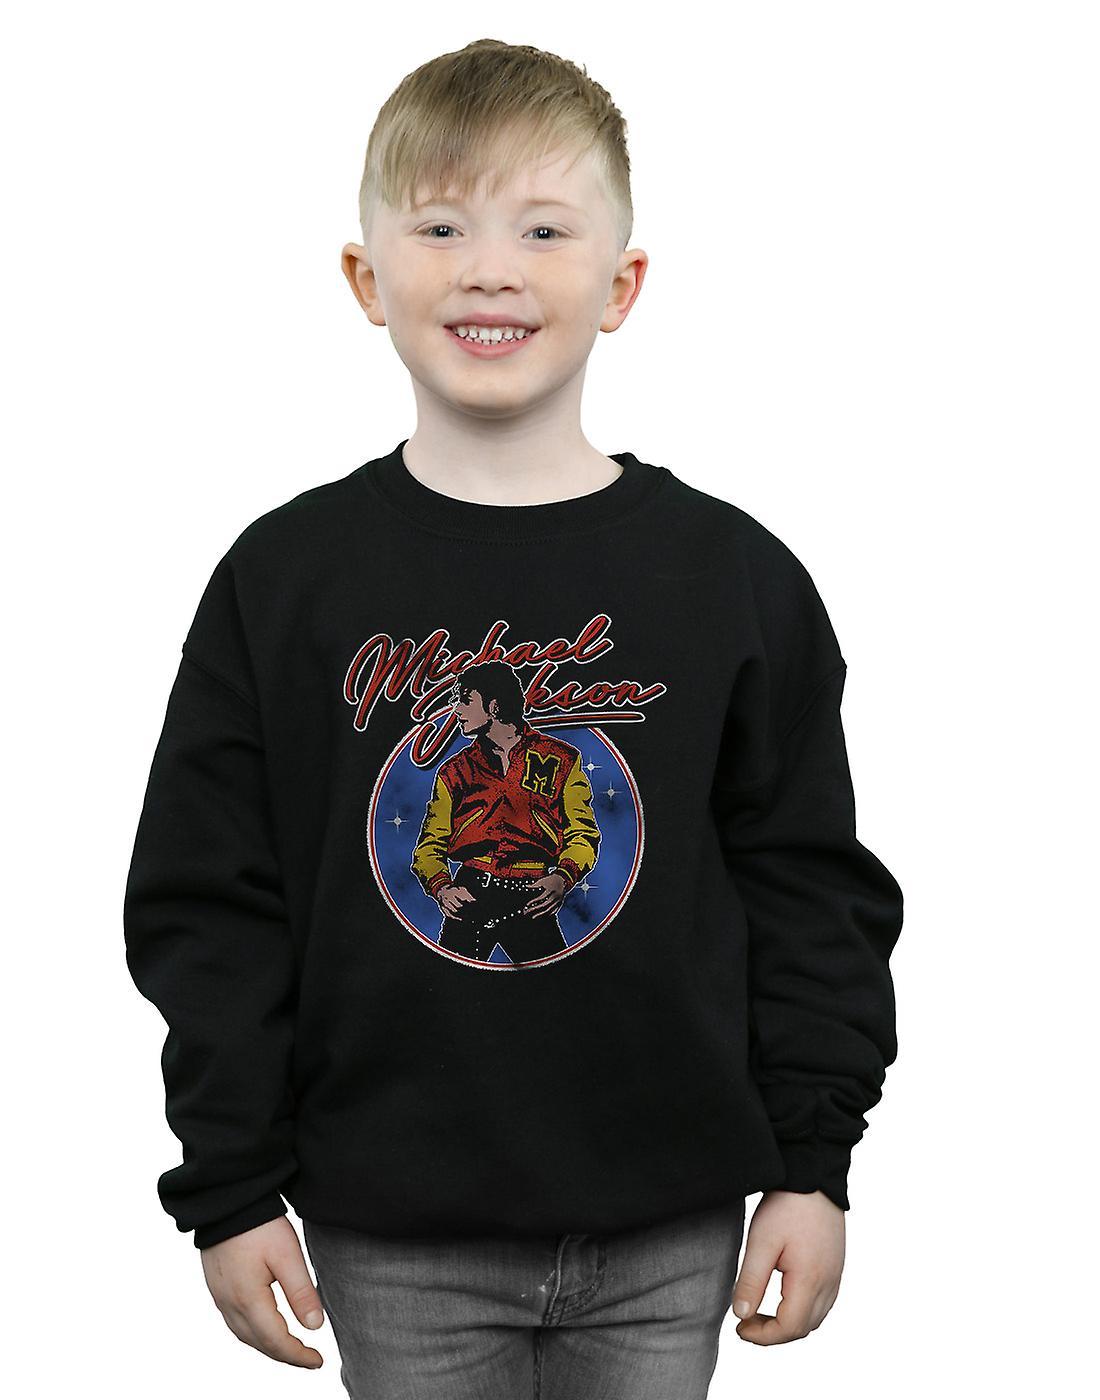 Michael Jackson Boys Circle Thriller Crest Sweatshirt